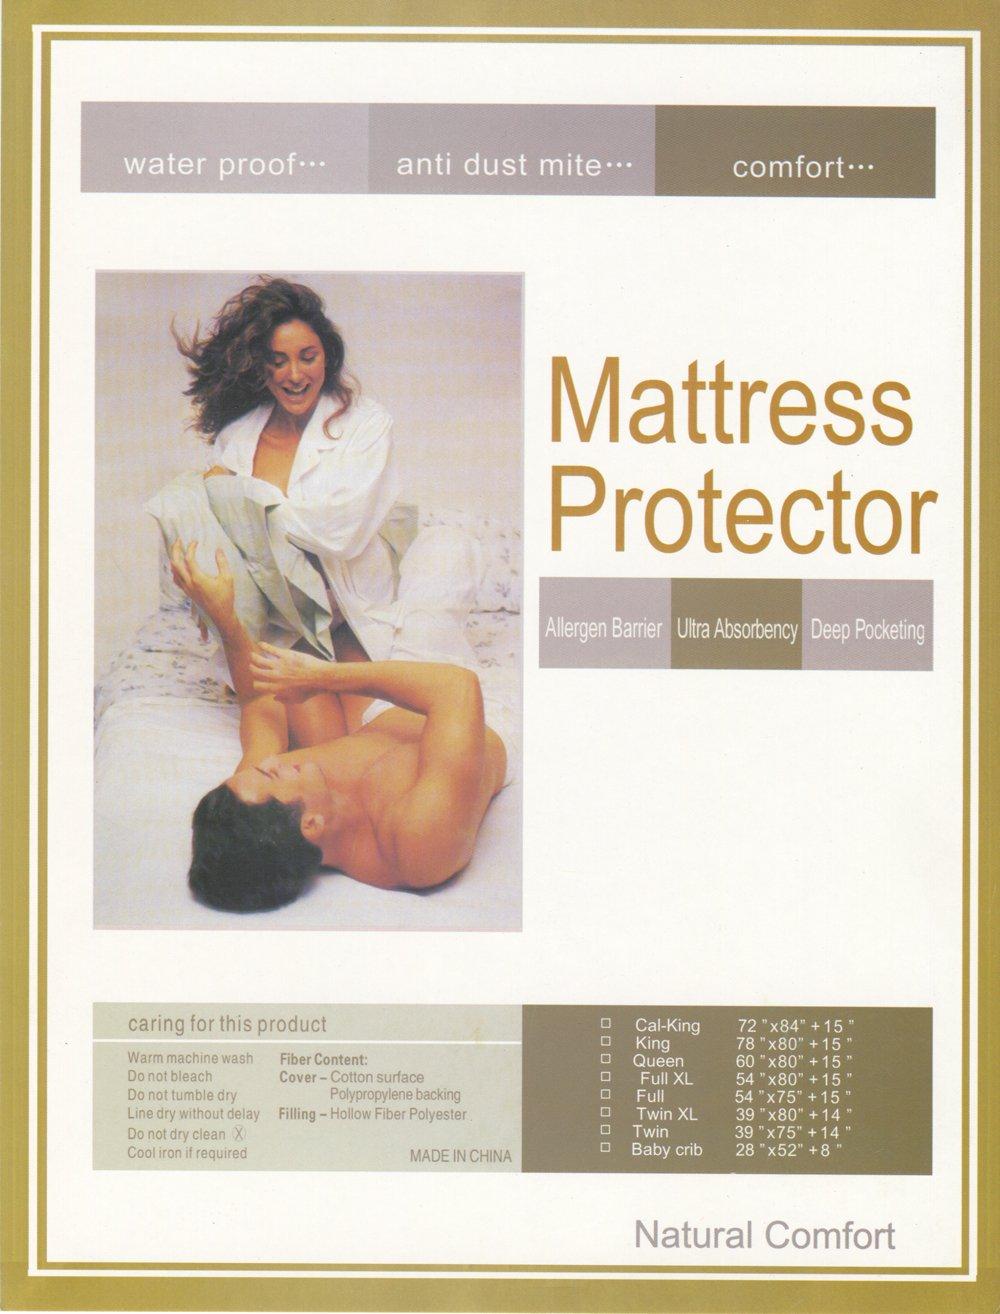 Baby cribs not made in china - Amazon Com Natural Comfort Waterproof Mattress Pad Super Absorbency Deep Pocket Home Kitchen